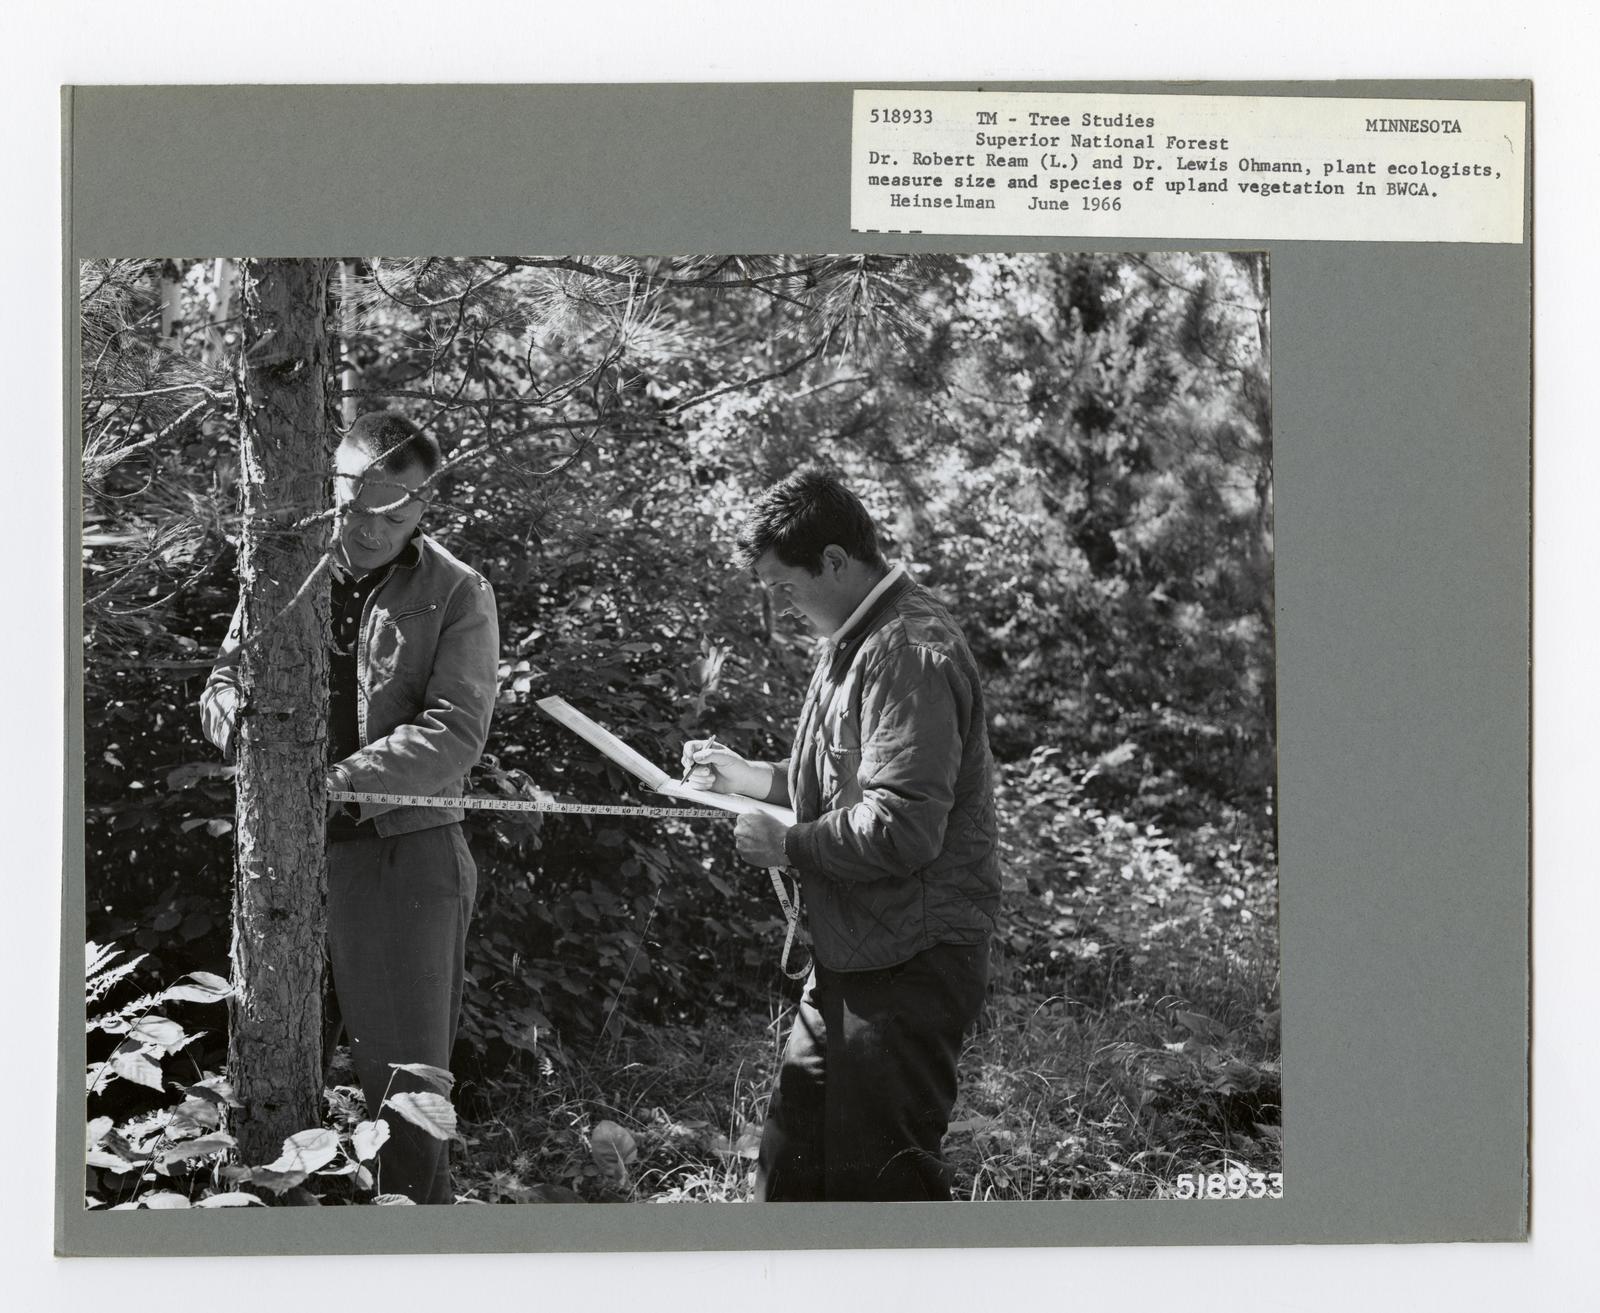 Forest Mensuration: Surveying/Studies - Minnesota